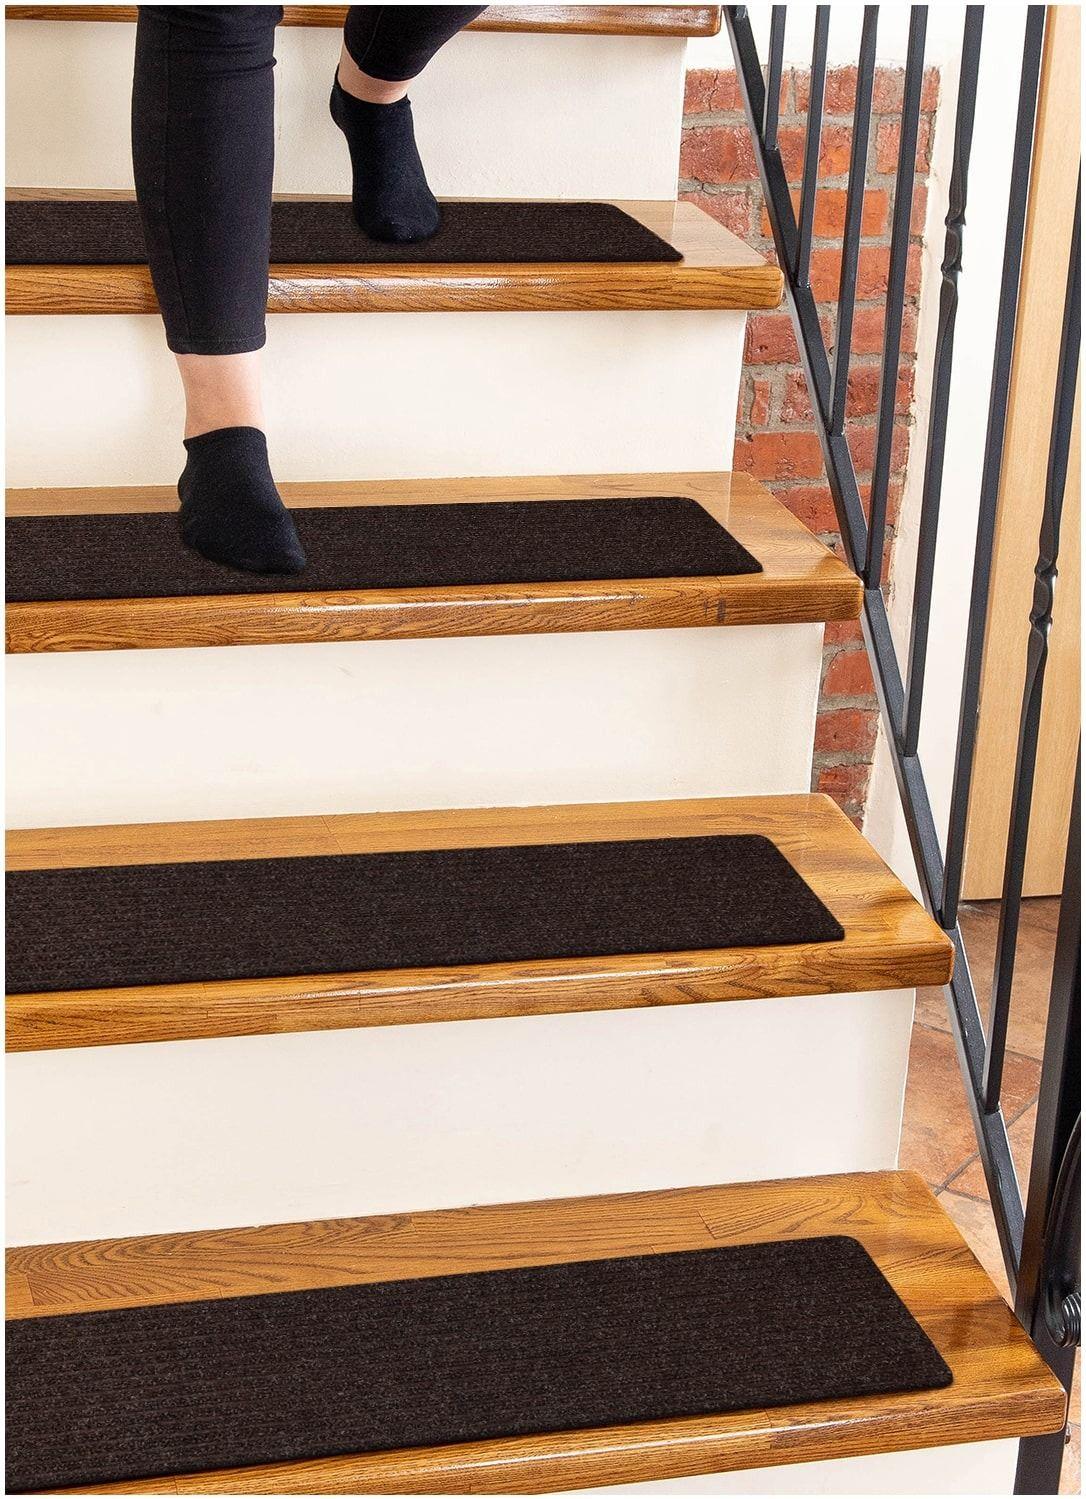 Best Prevent Slipping Just Like Stair Runners For Wooden Steps 400 x 300